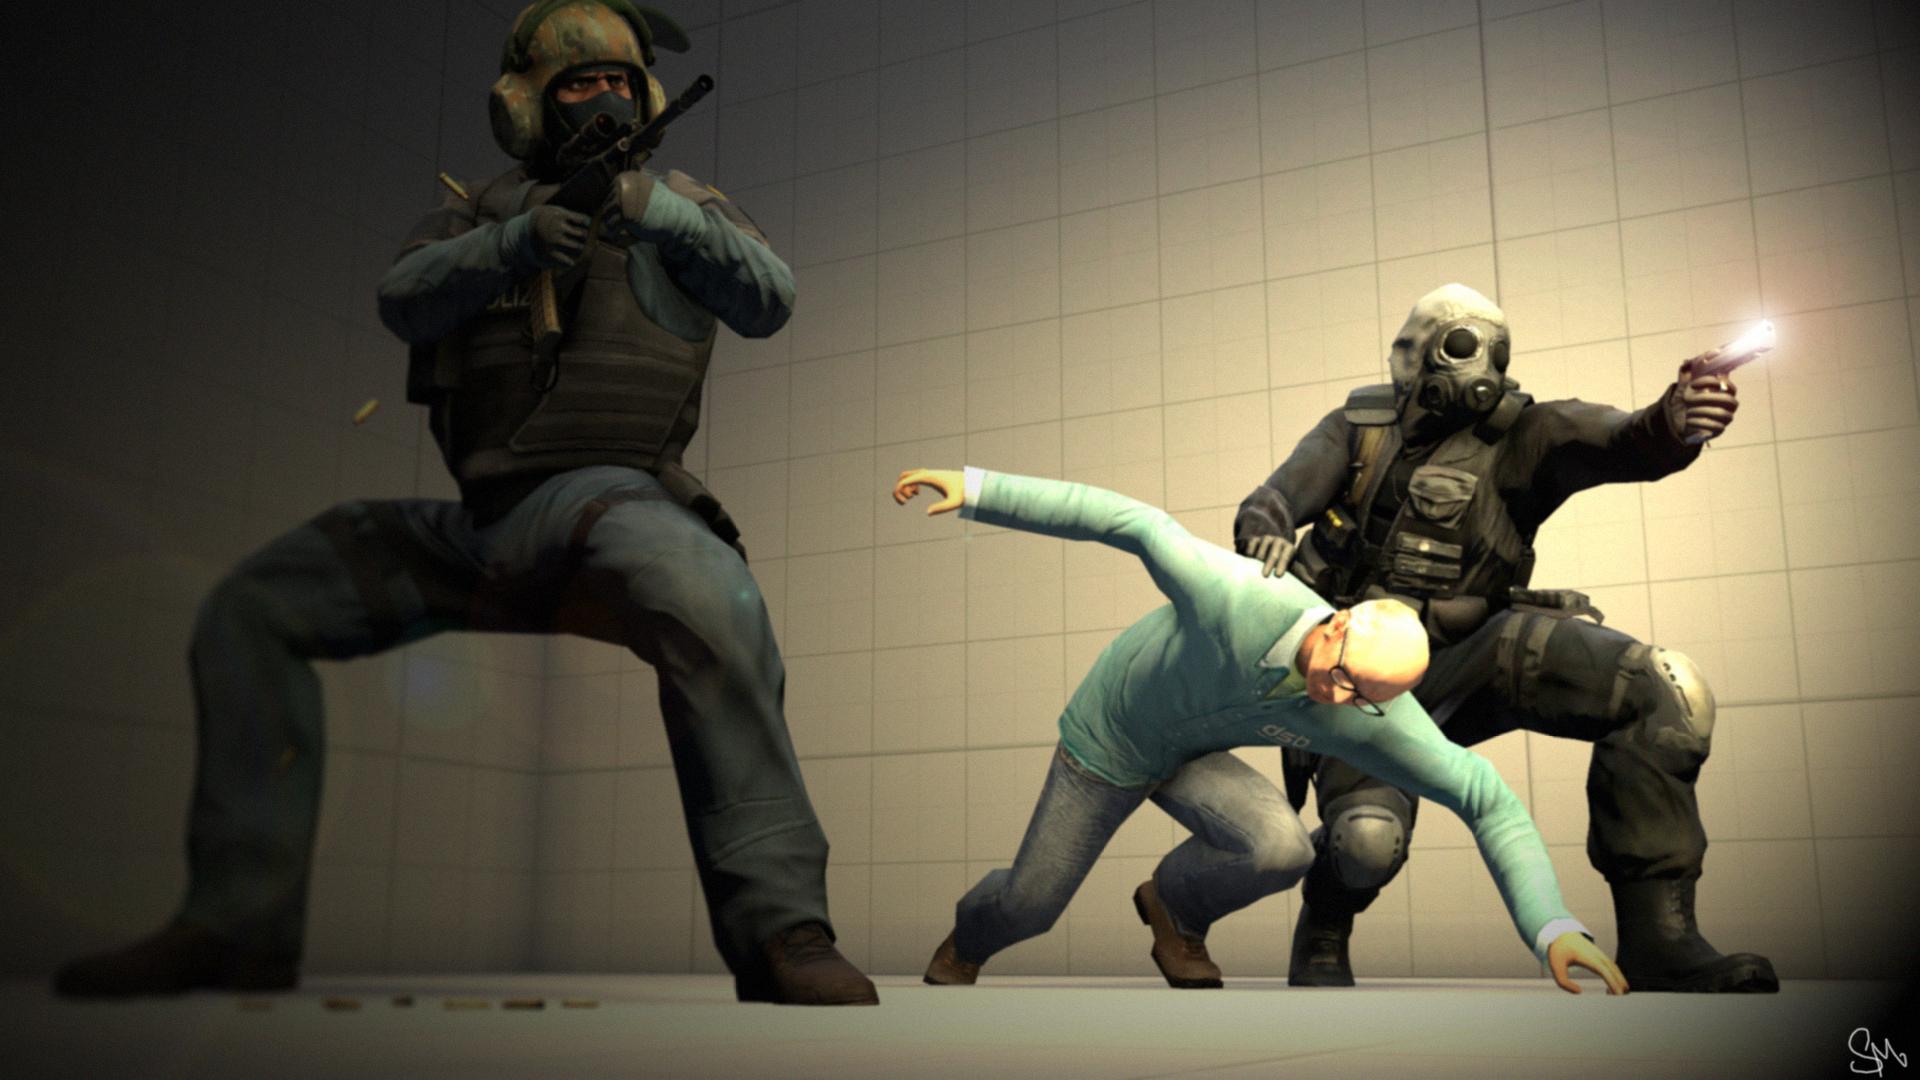 CS:GO Hostage Situation